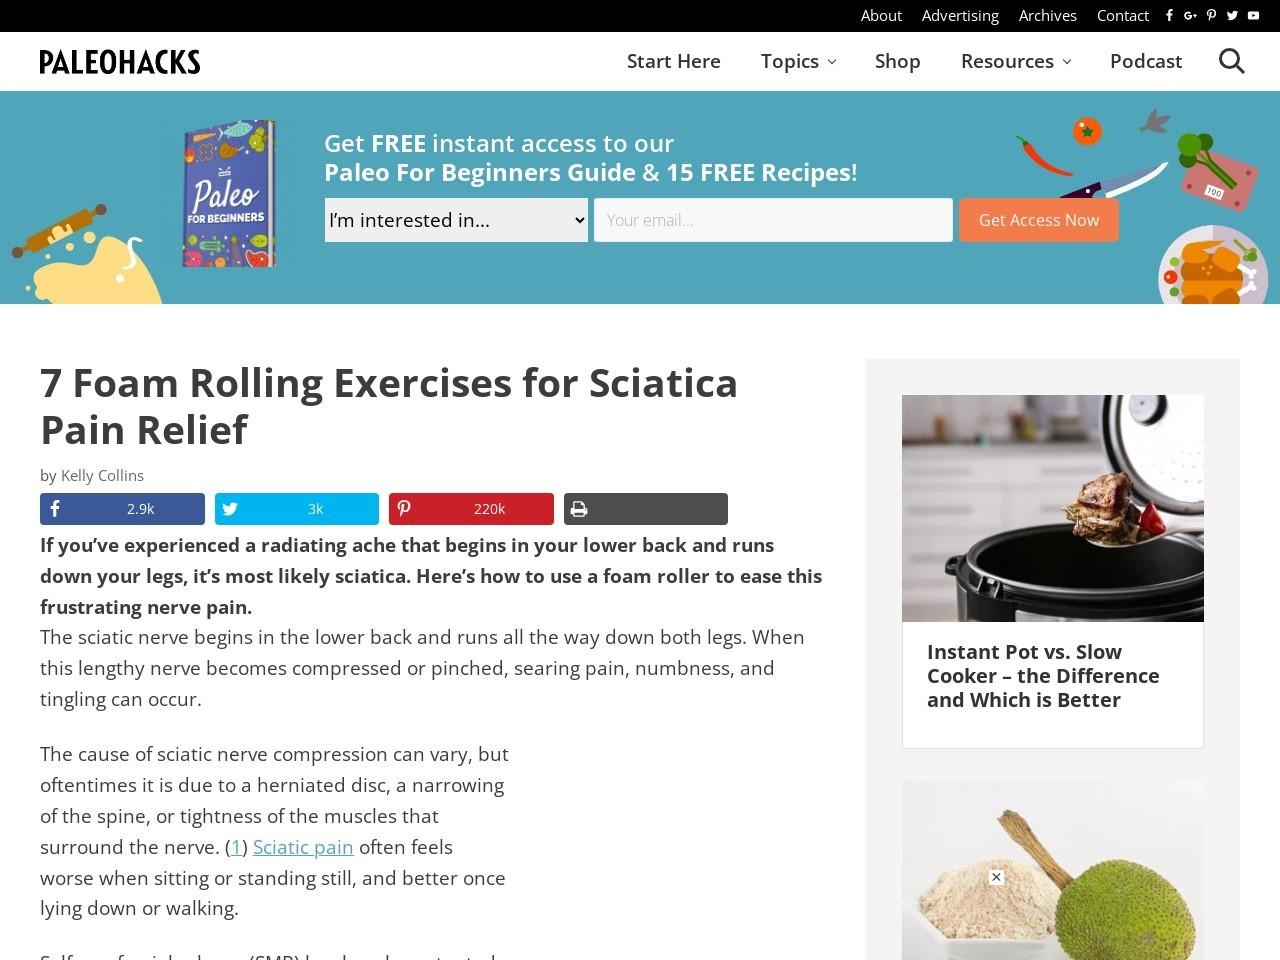 7 Foam Rolling Exercises for Sciatica Pain Relief